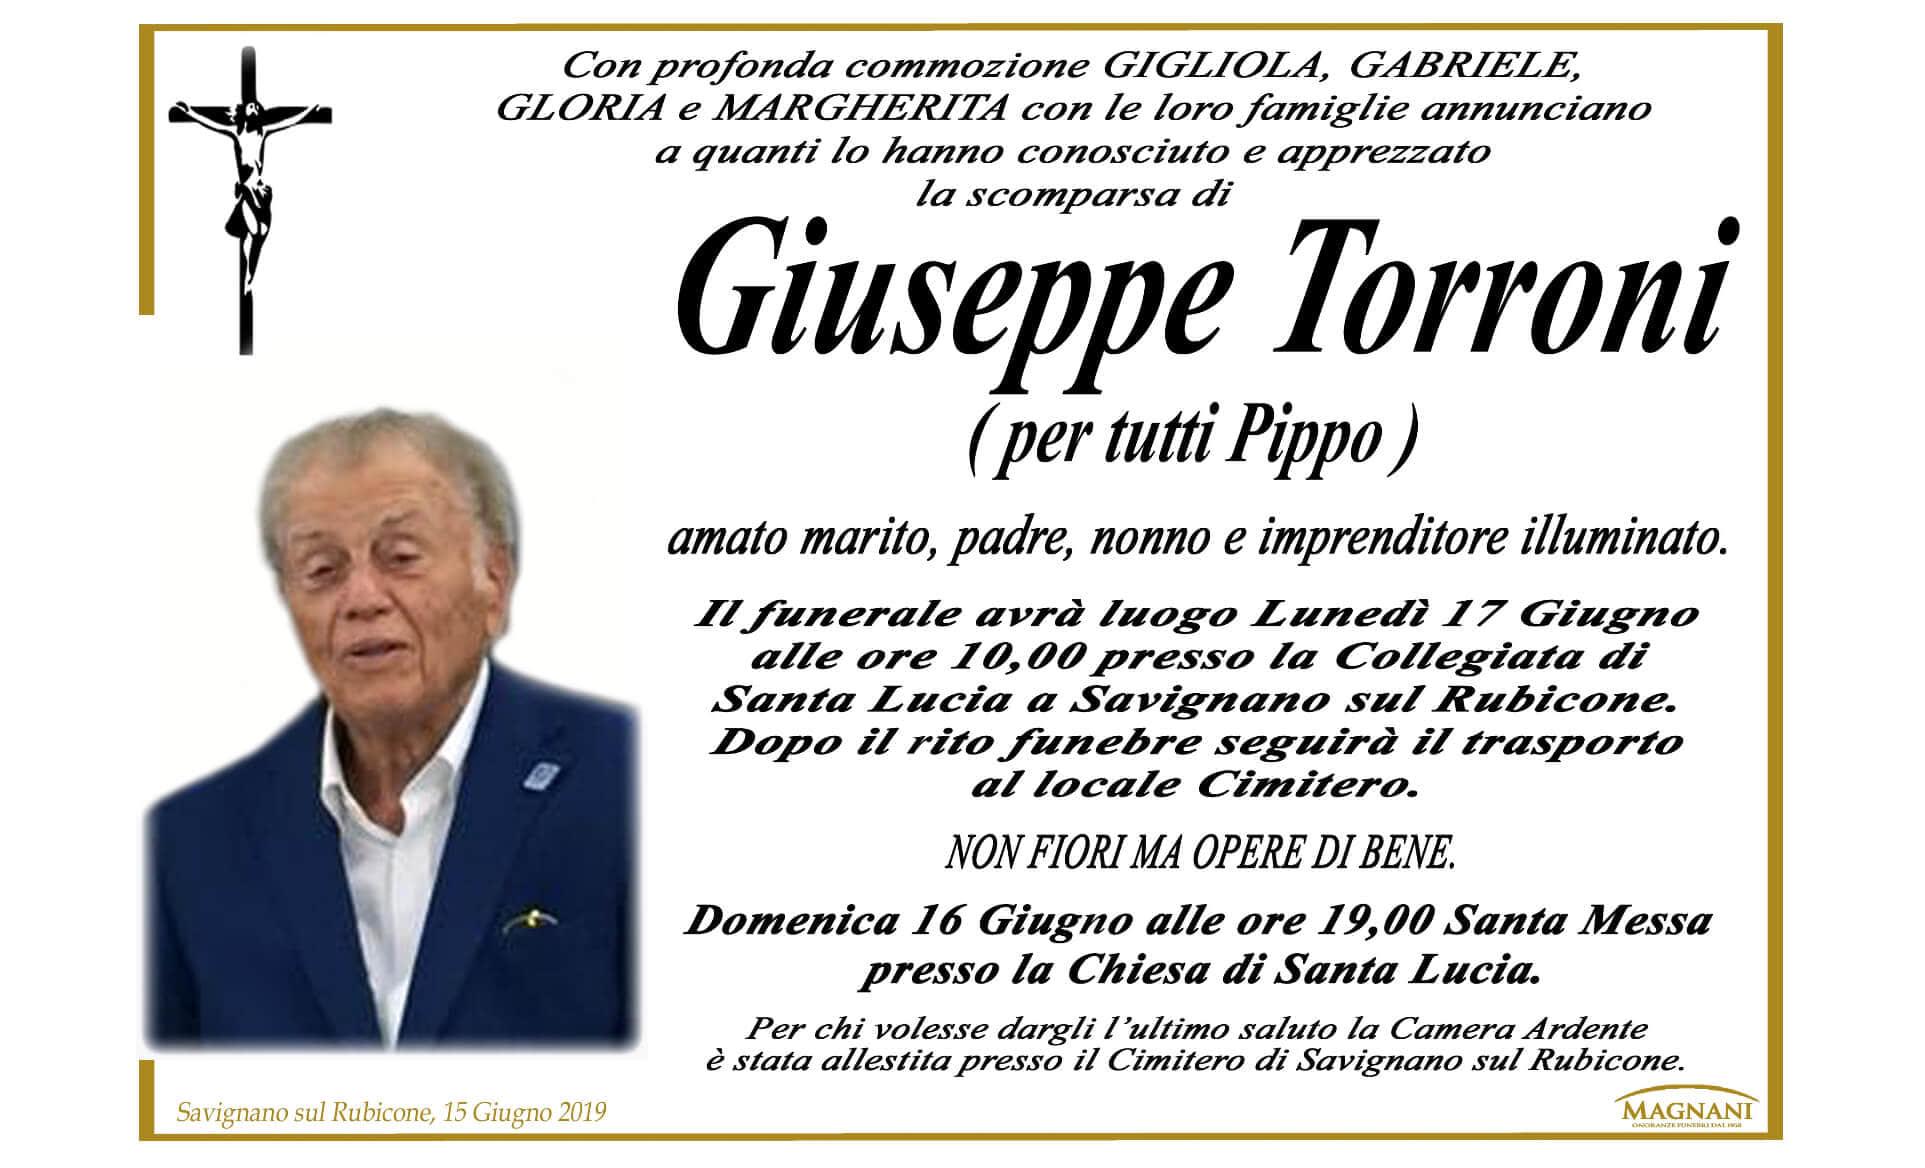 giuseppe-torroni1-2